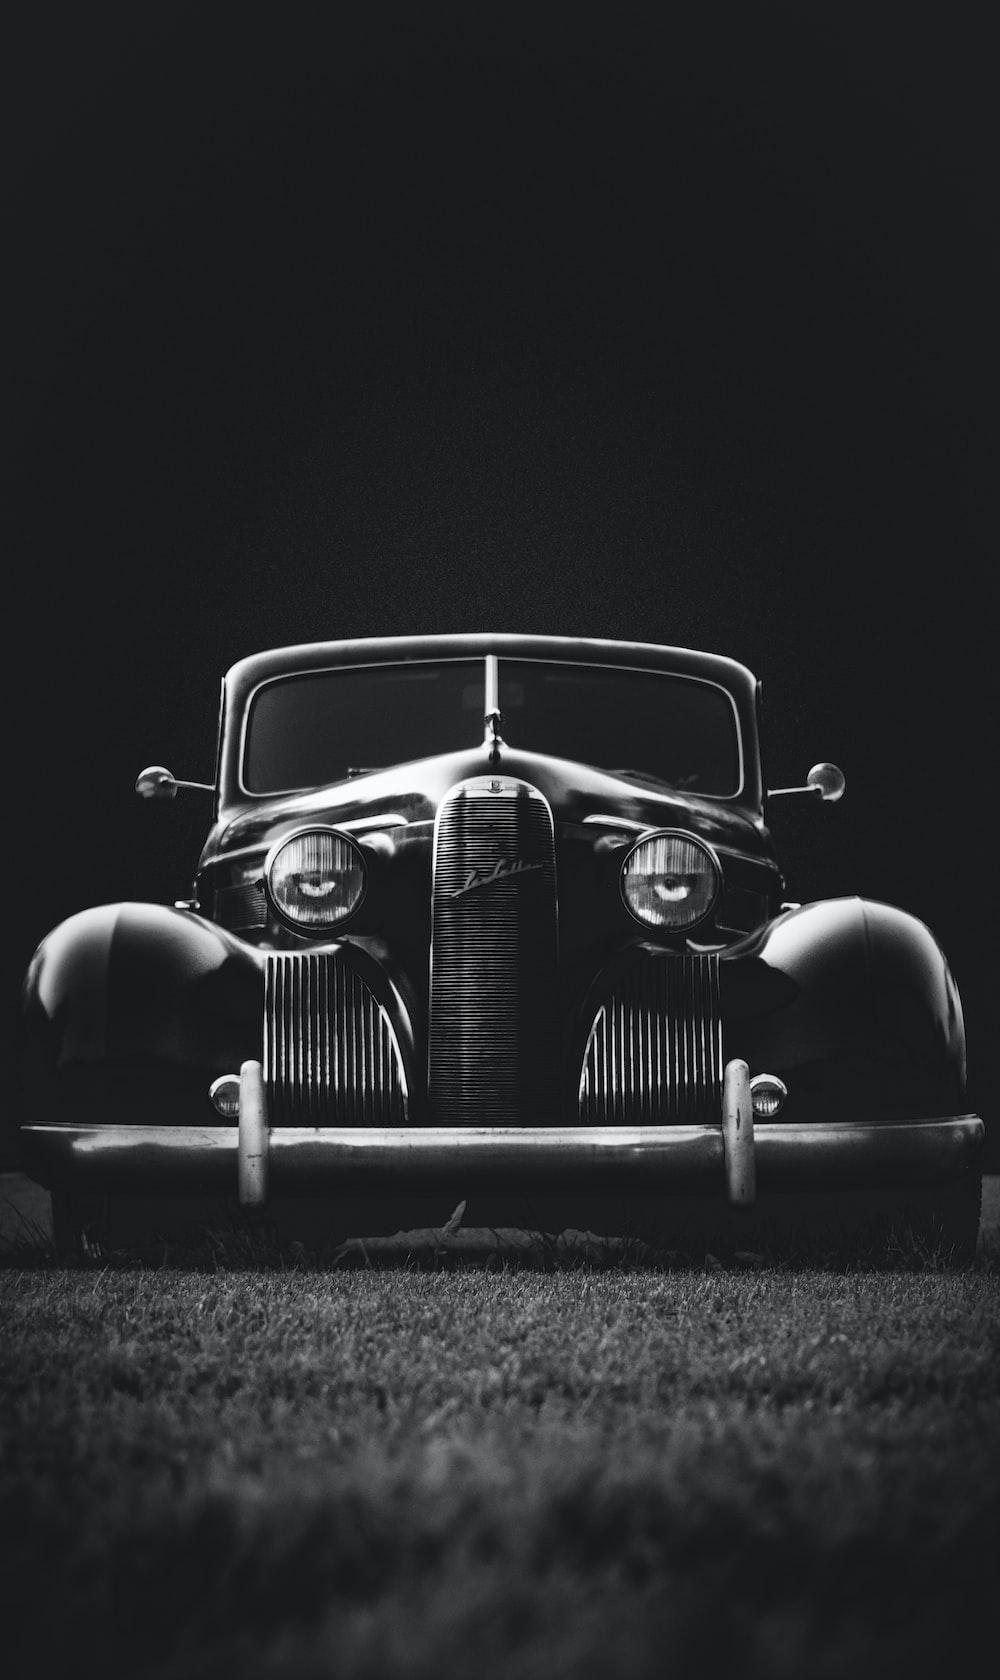 greyscale photo of classic vehicle on ground